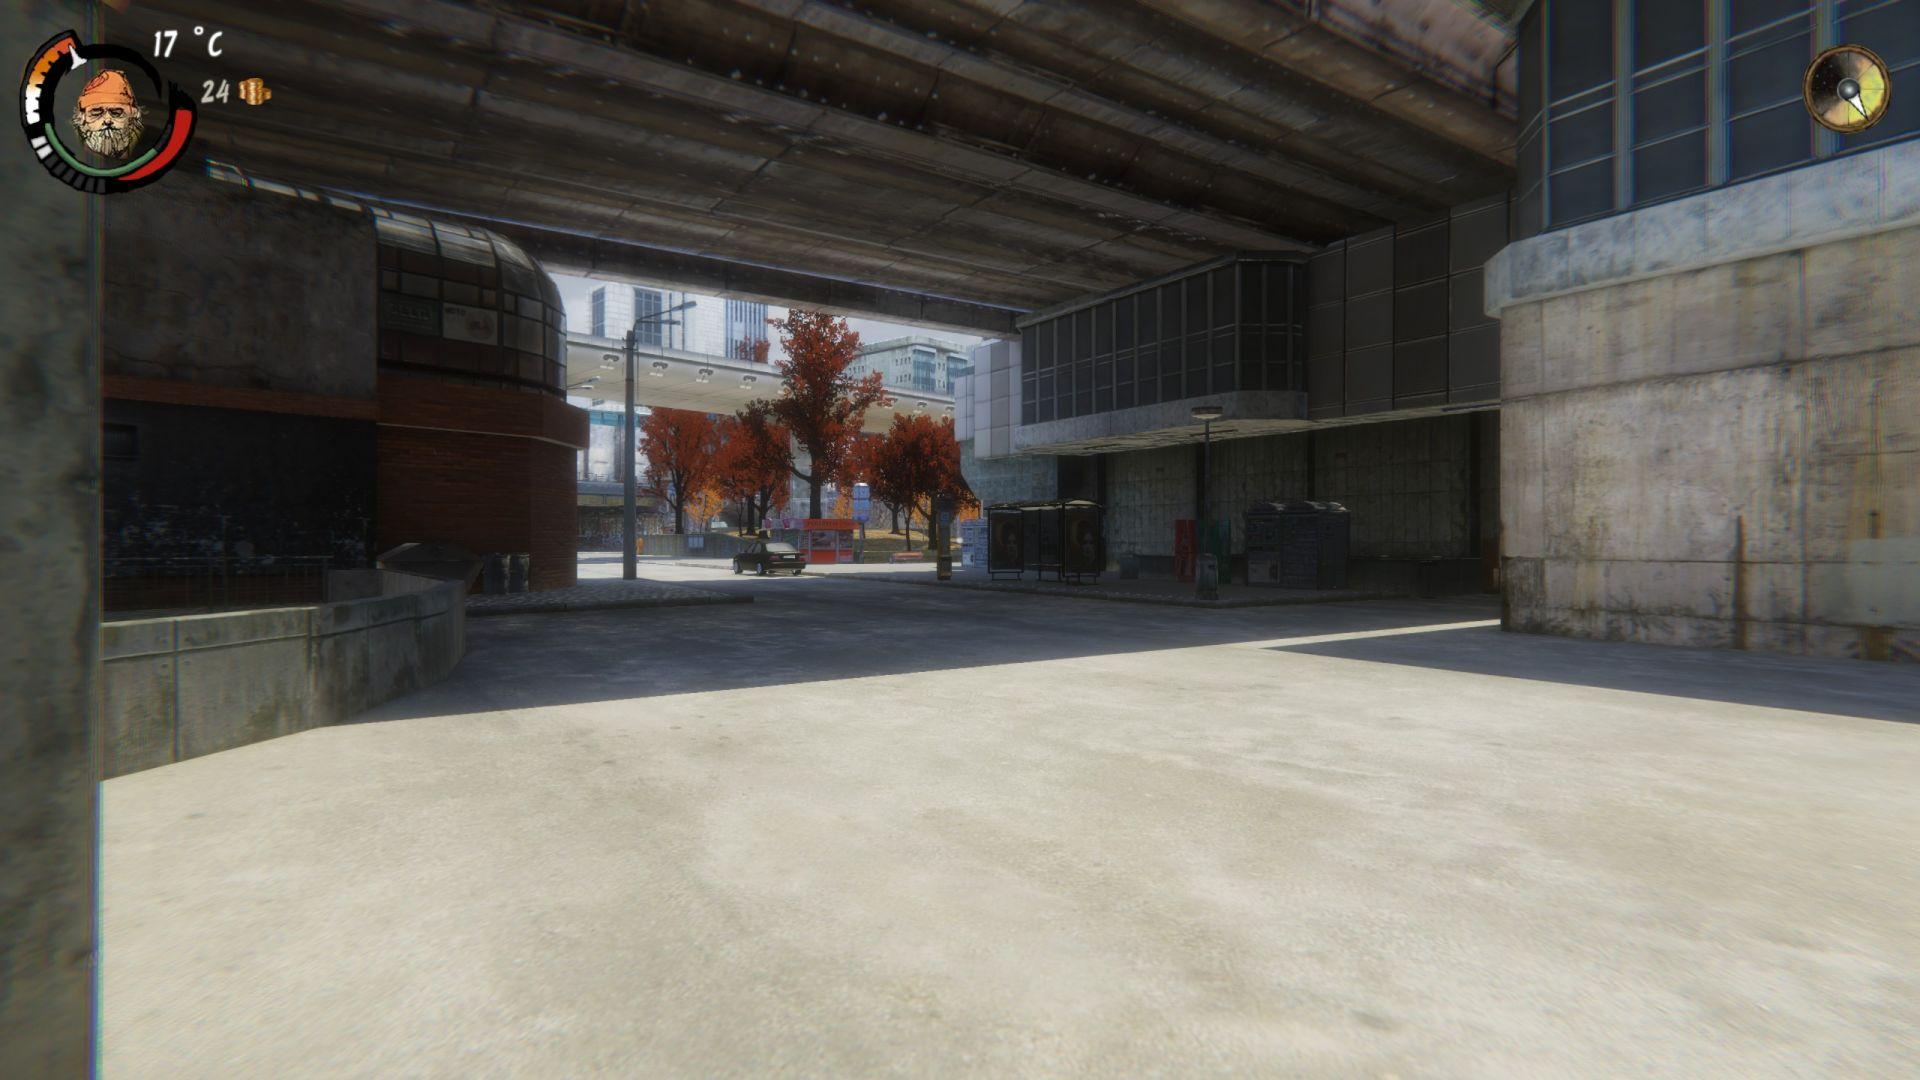 Pod mostem je hej!